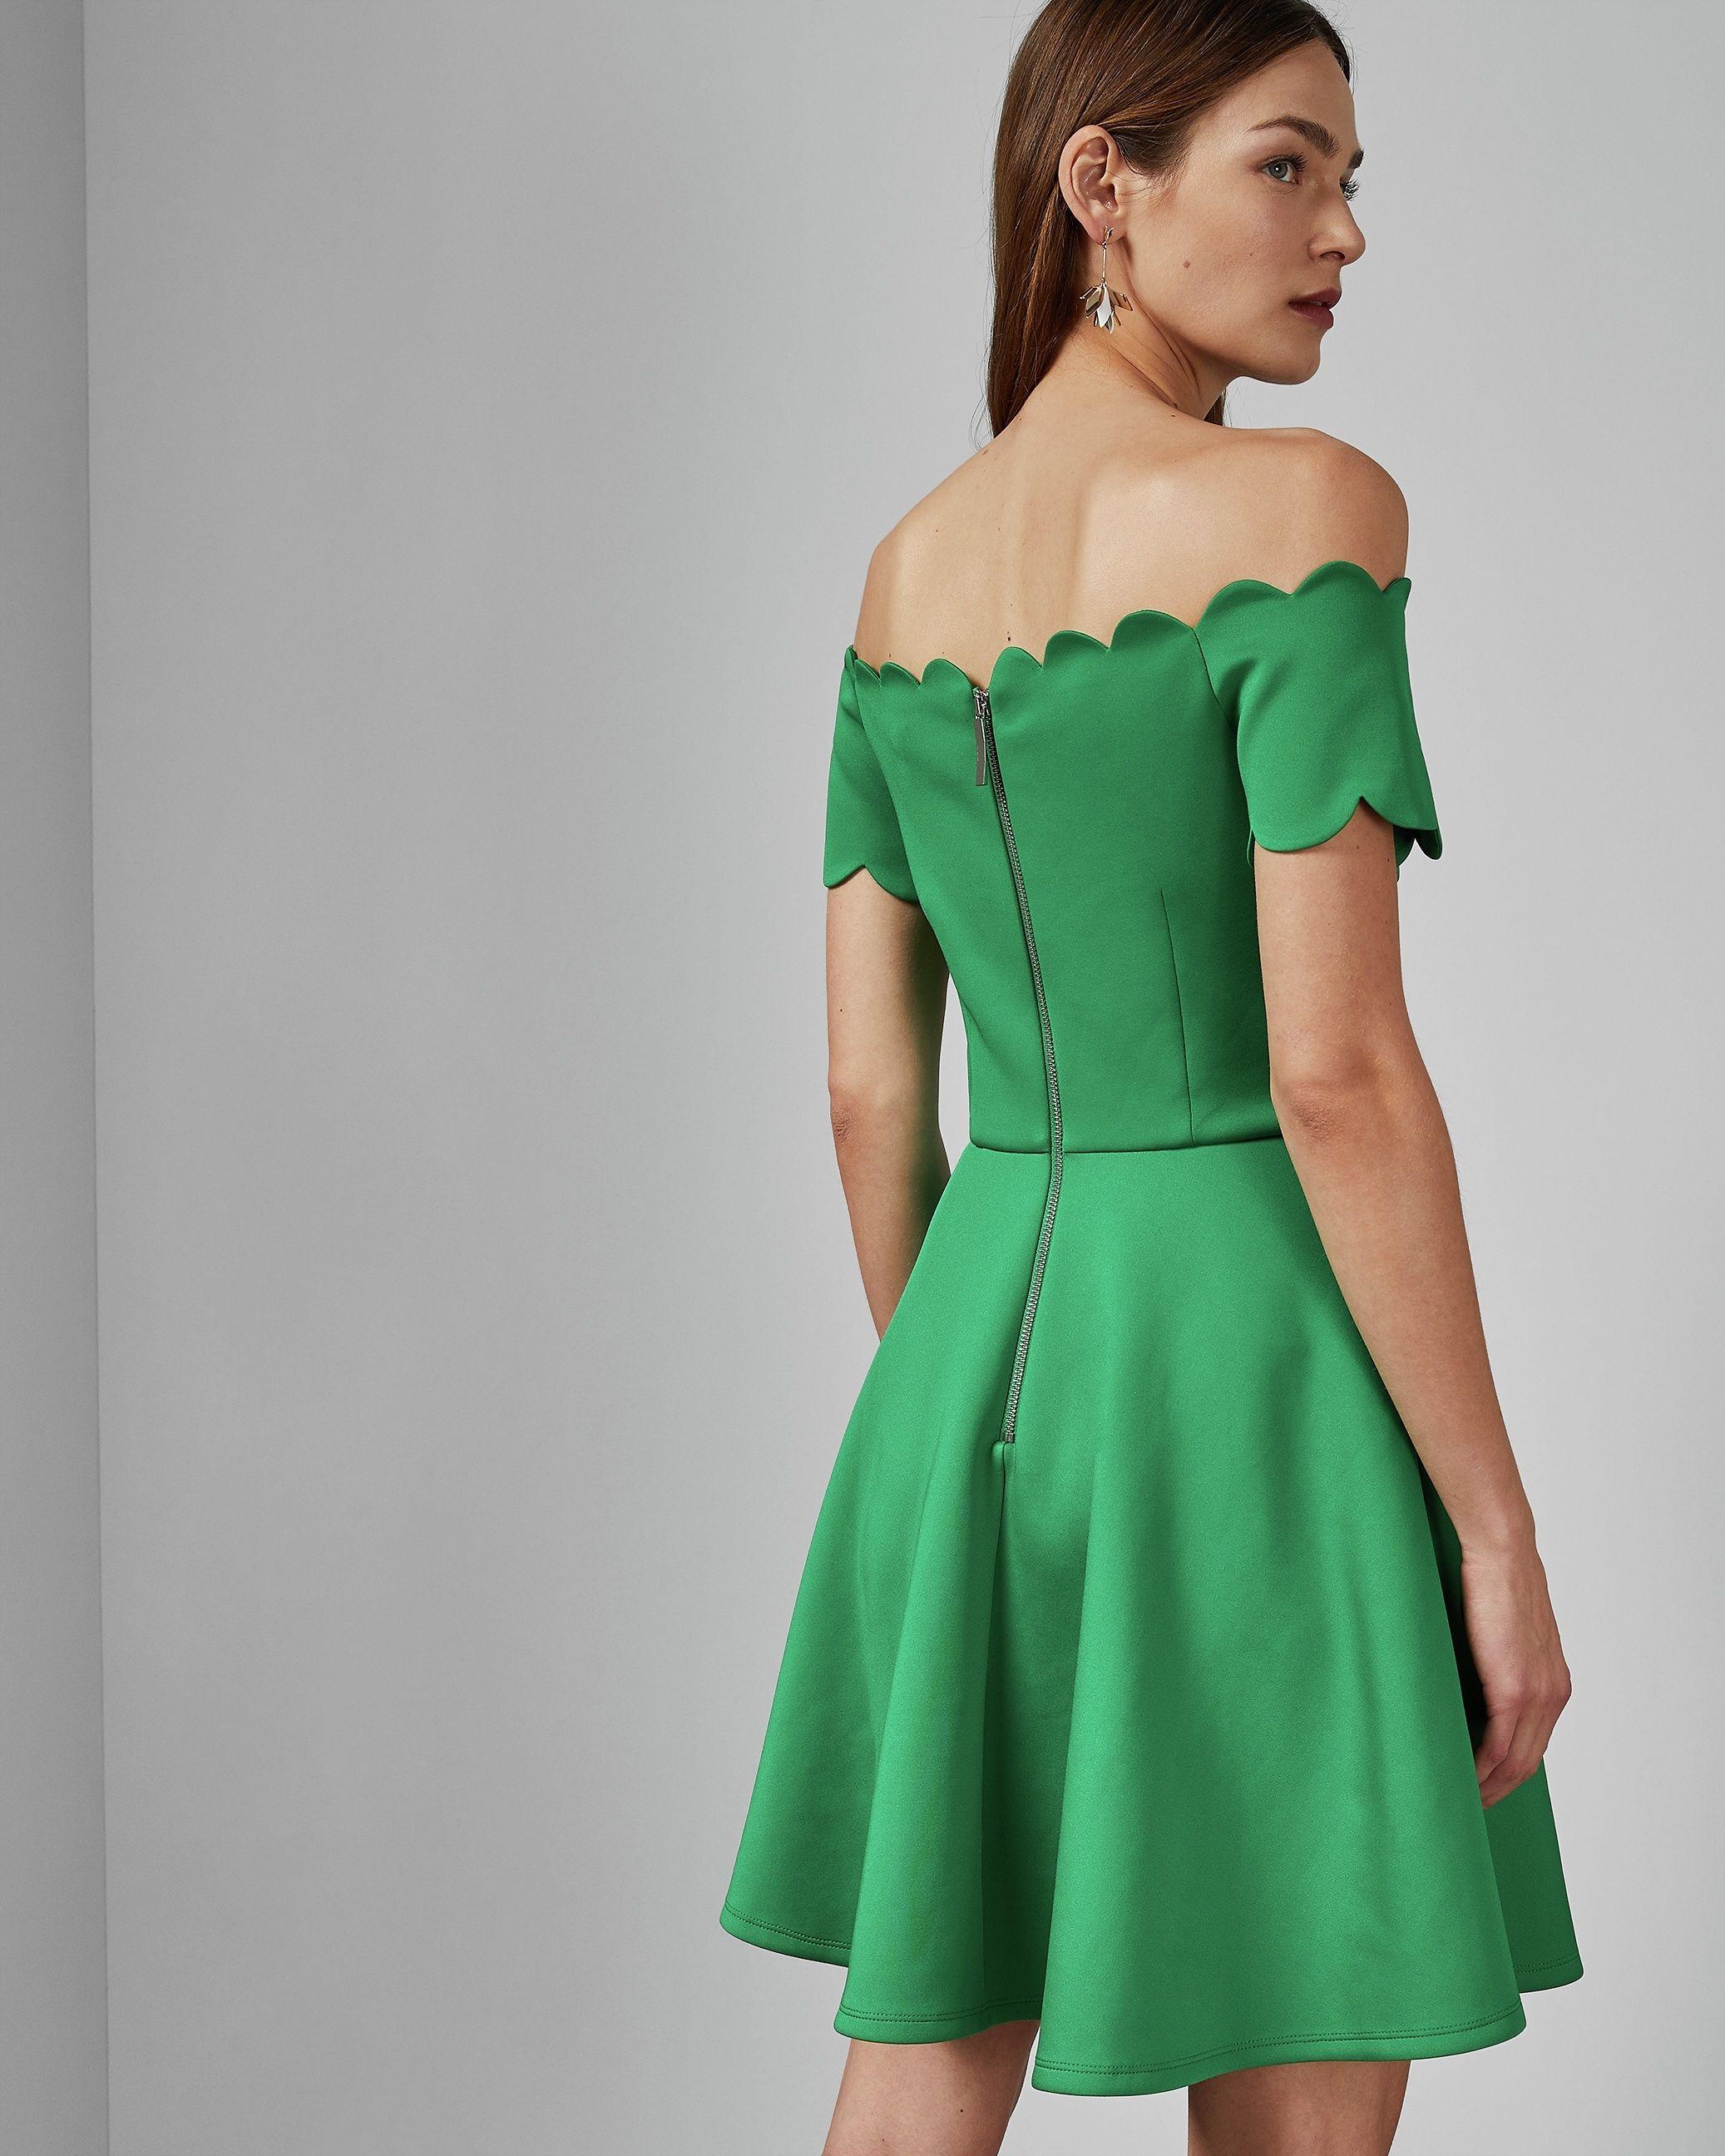 Ted Baker Fellama Bardot Scallop Skater Dress in Bright Green